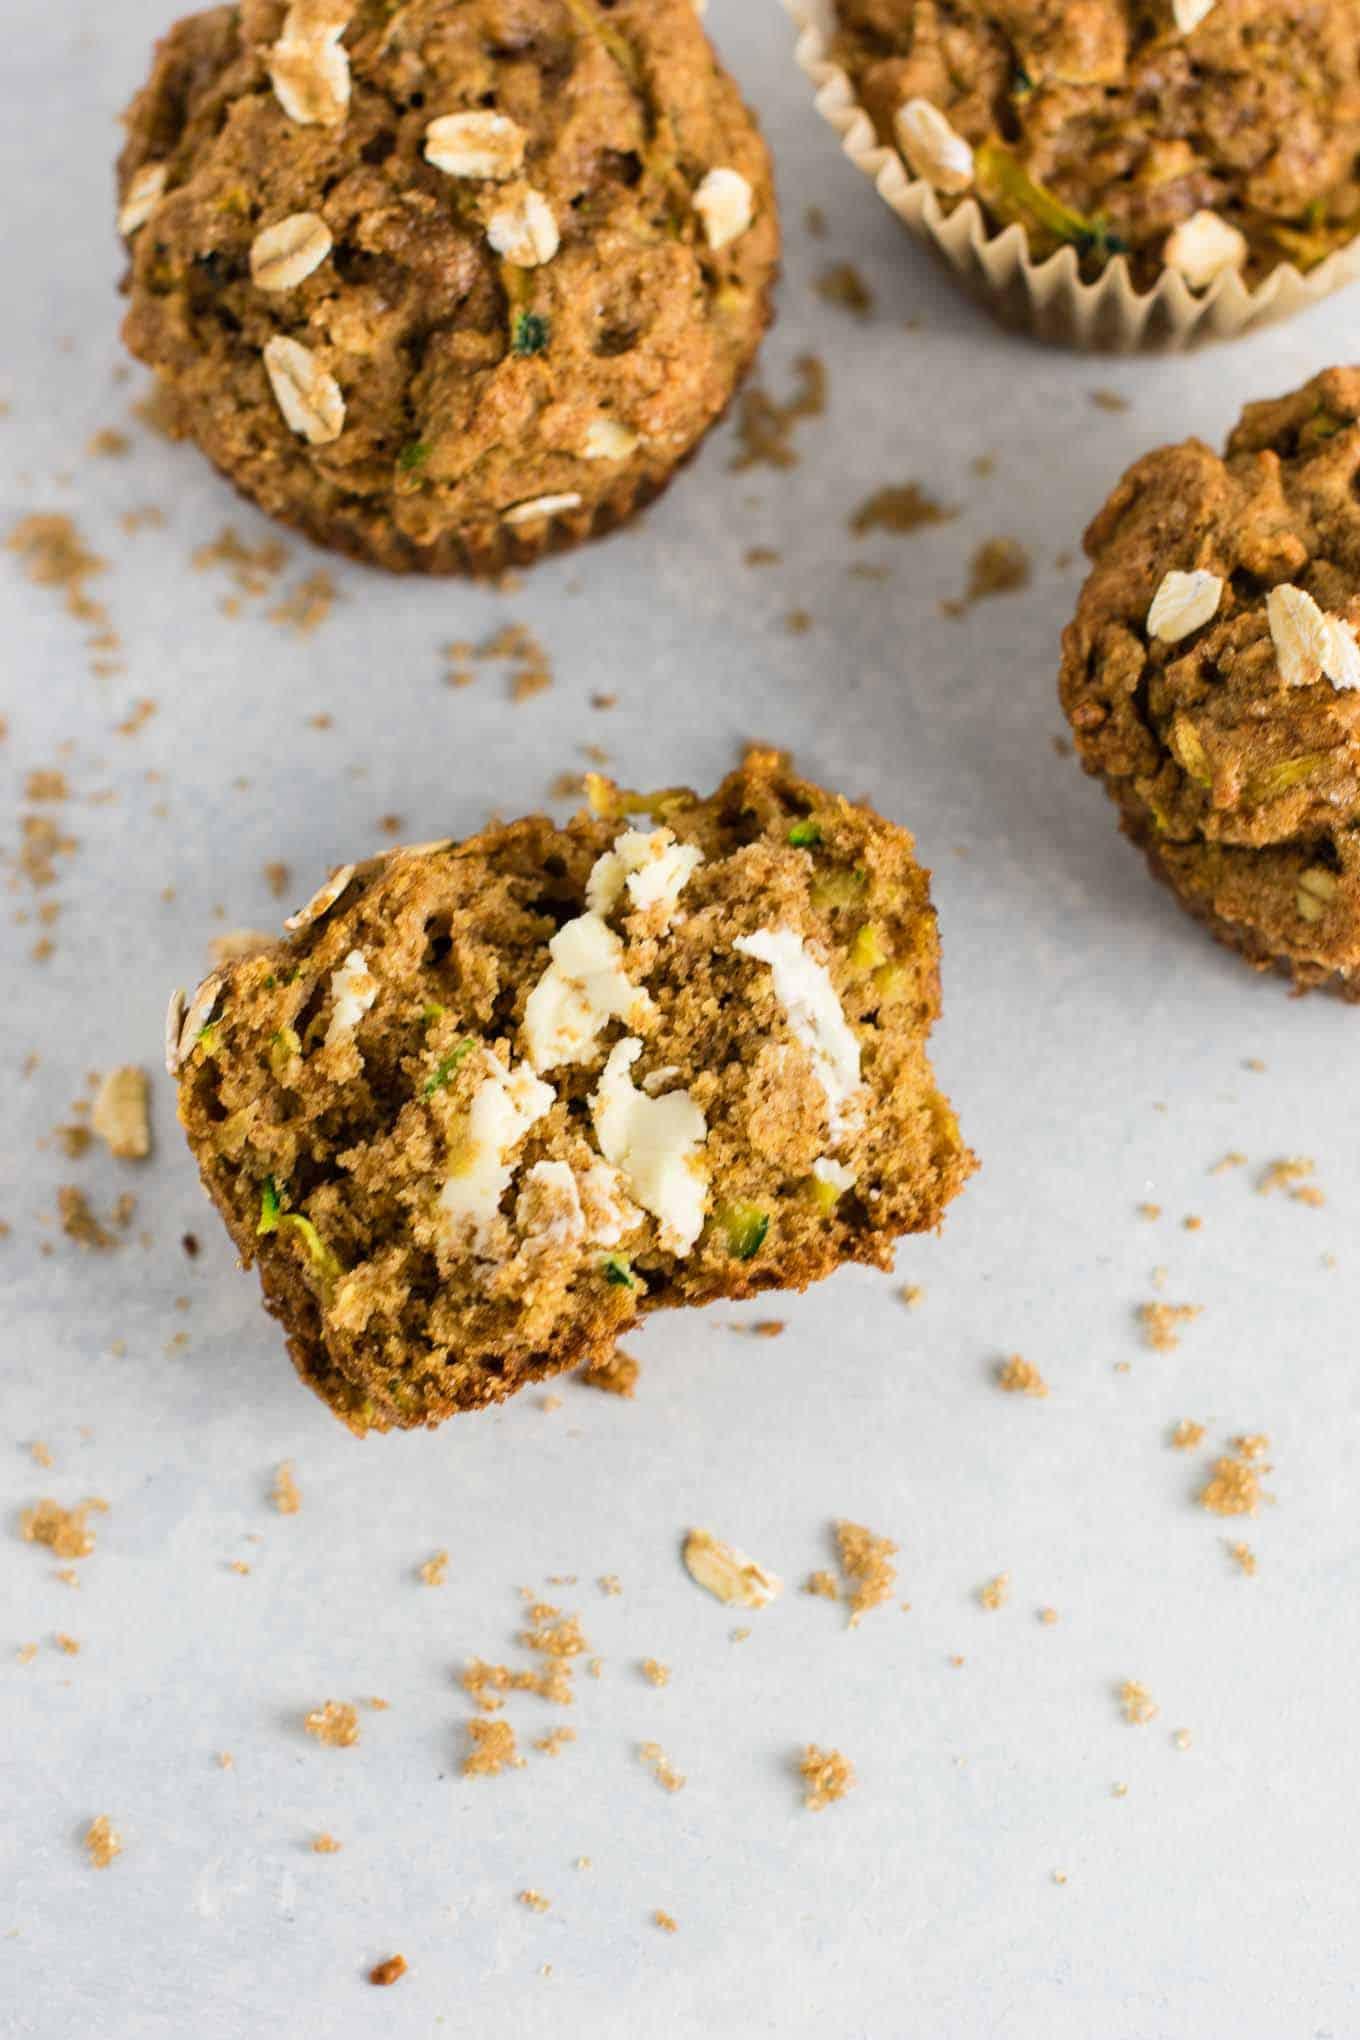 Healthy Zucchini Bread Muffins  Healthy Zucchini Bread Muffins with brown sugar